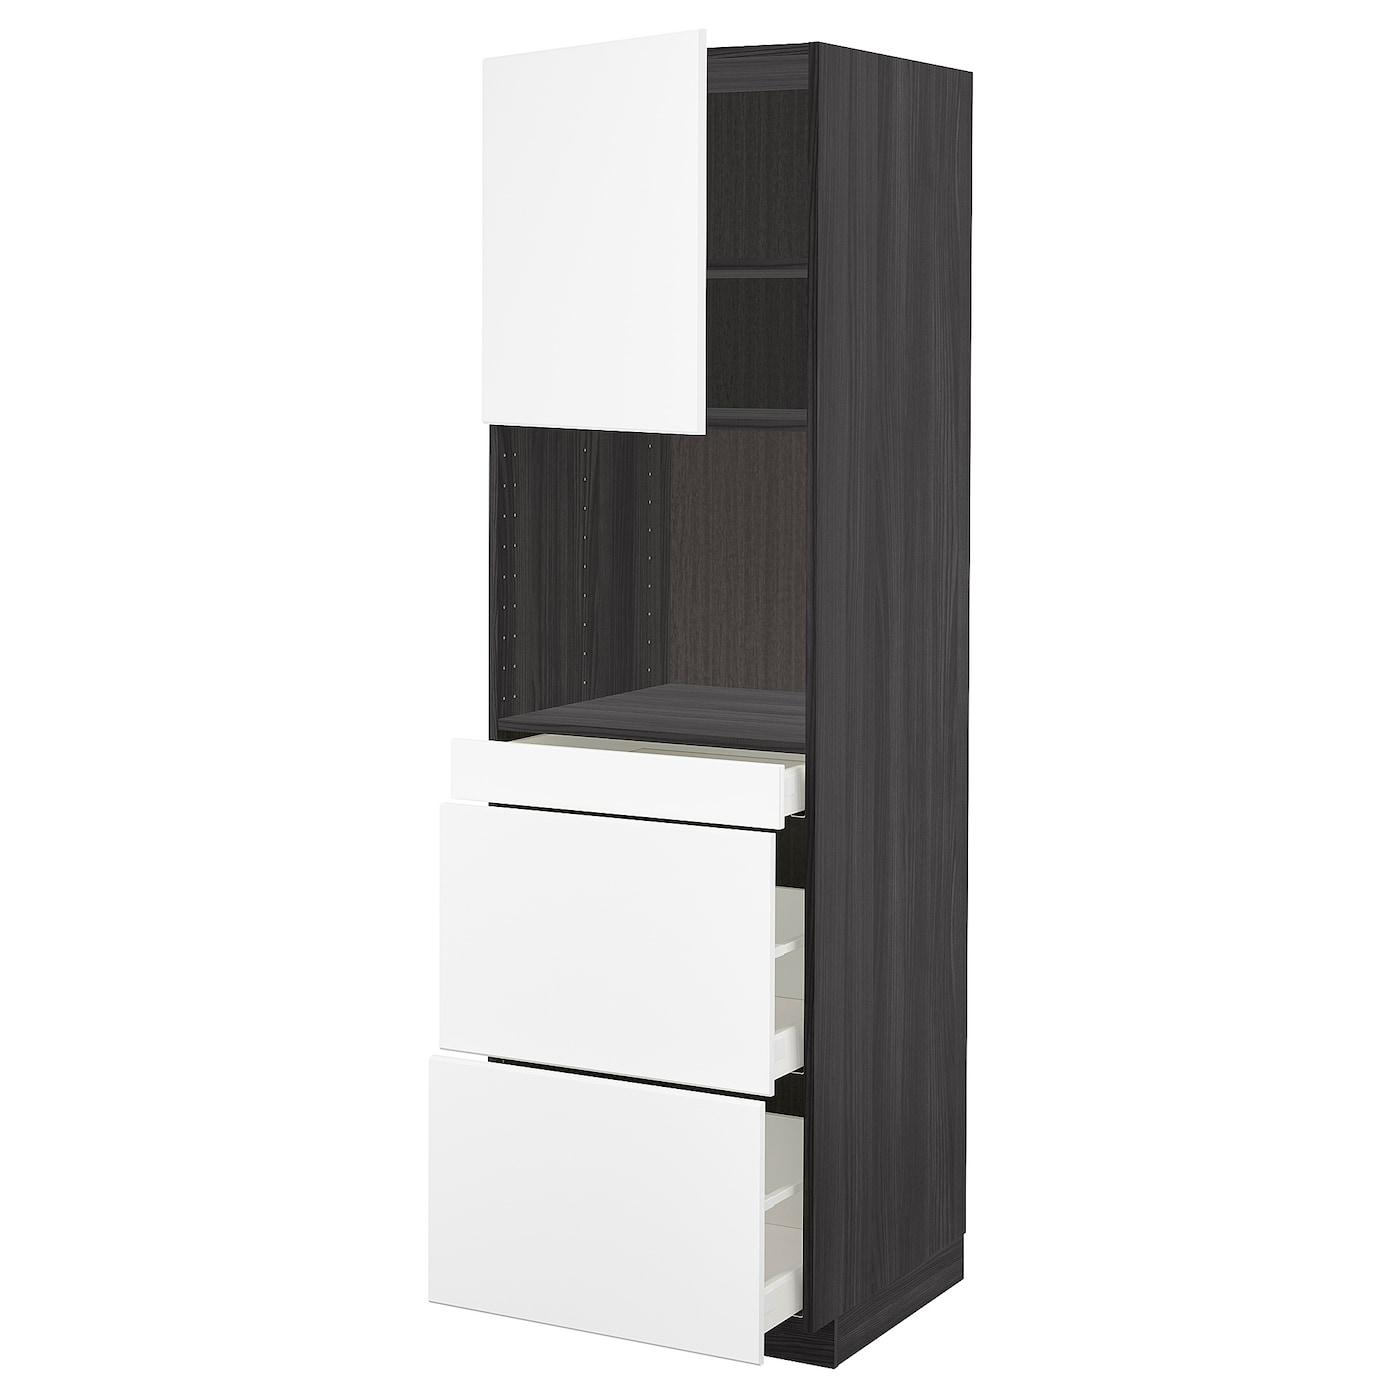 metod maximera armoire micro ondes av porte 3 tir noir. Black Bedroom Furniture Sets. Home Design Ideas